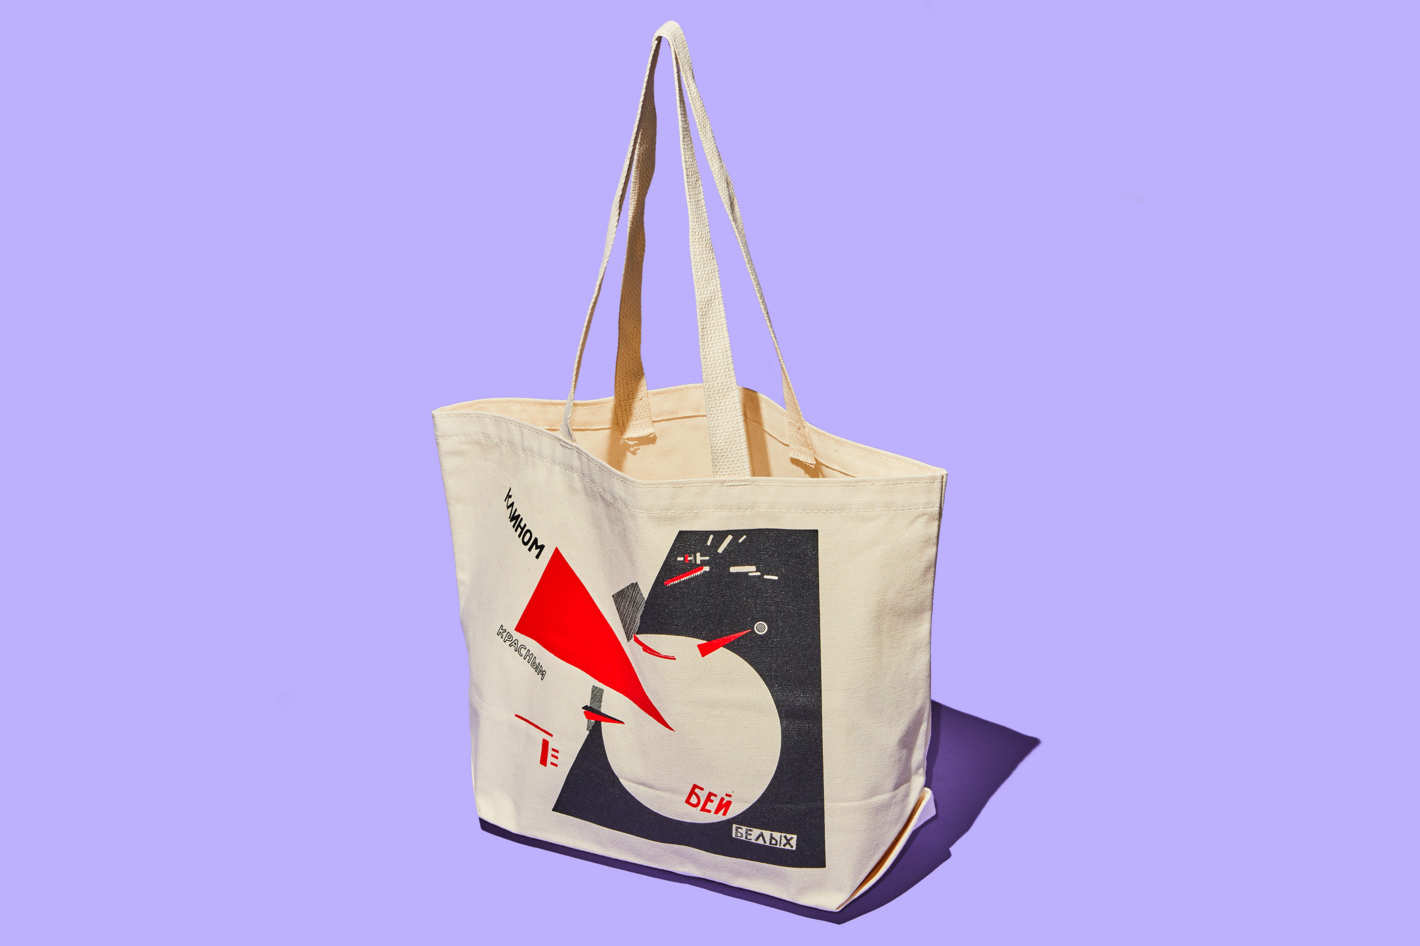 The Best Status Tote Bags